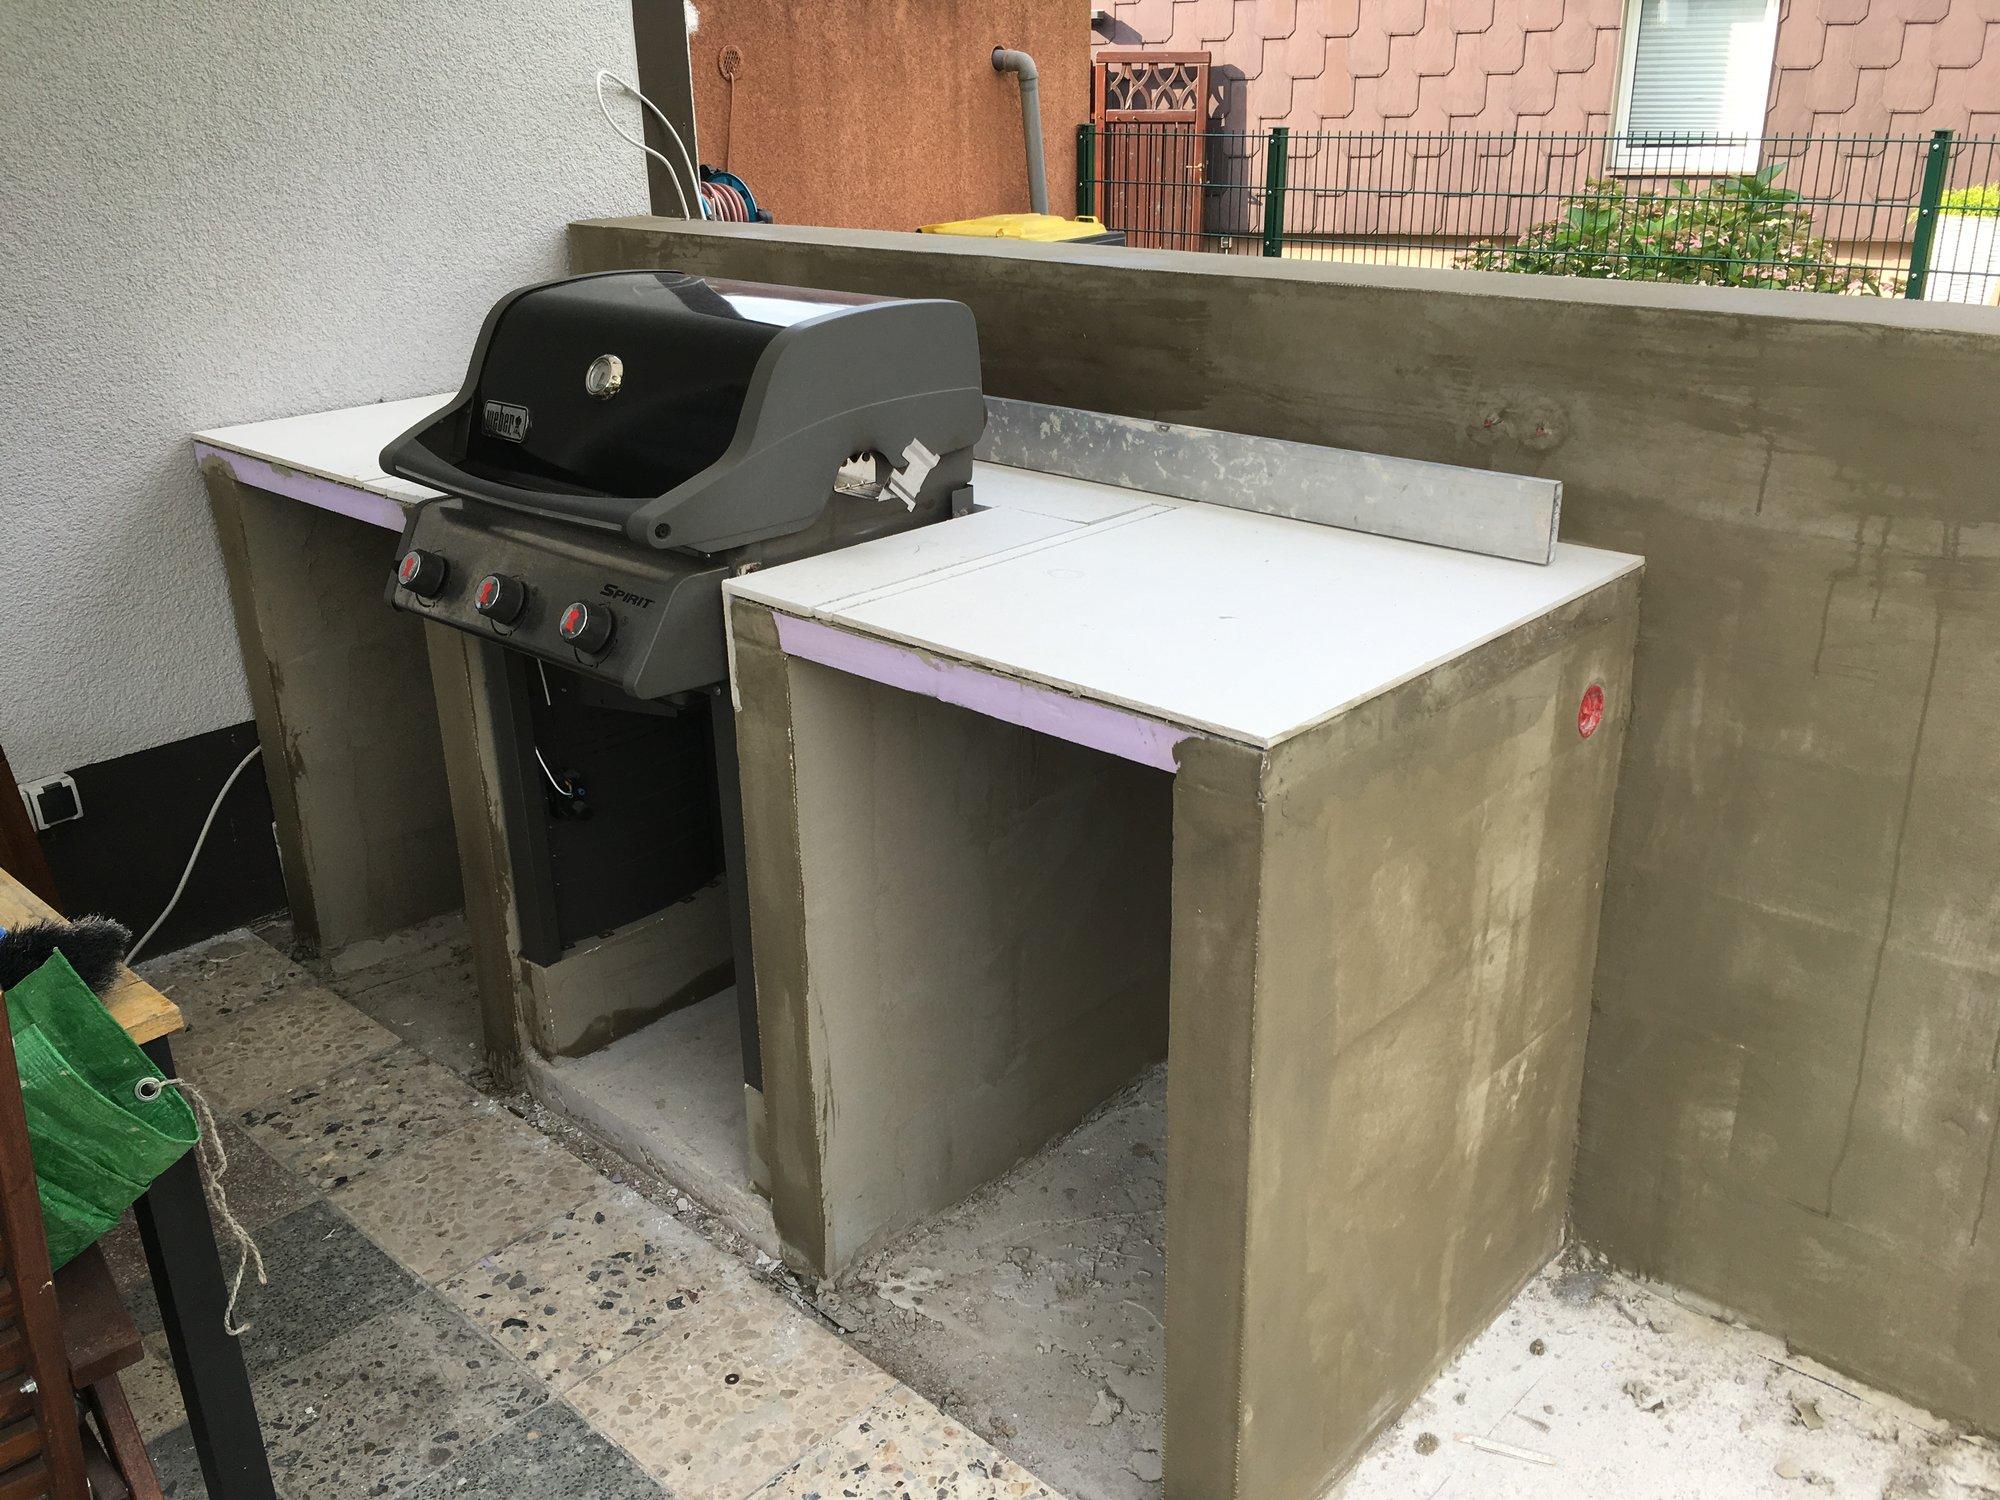 Weber Outdoor Küche Vergleich : Weber outdoor küche vergleich weber grill in outdoor küche